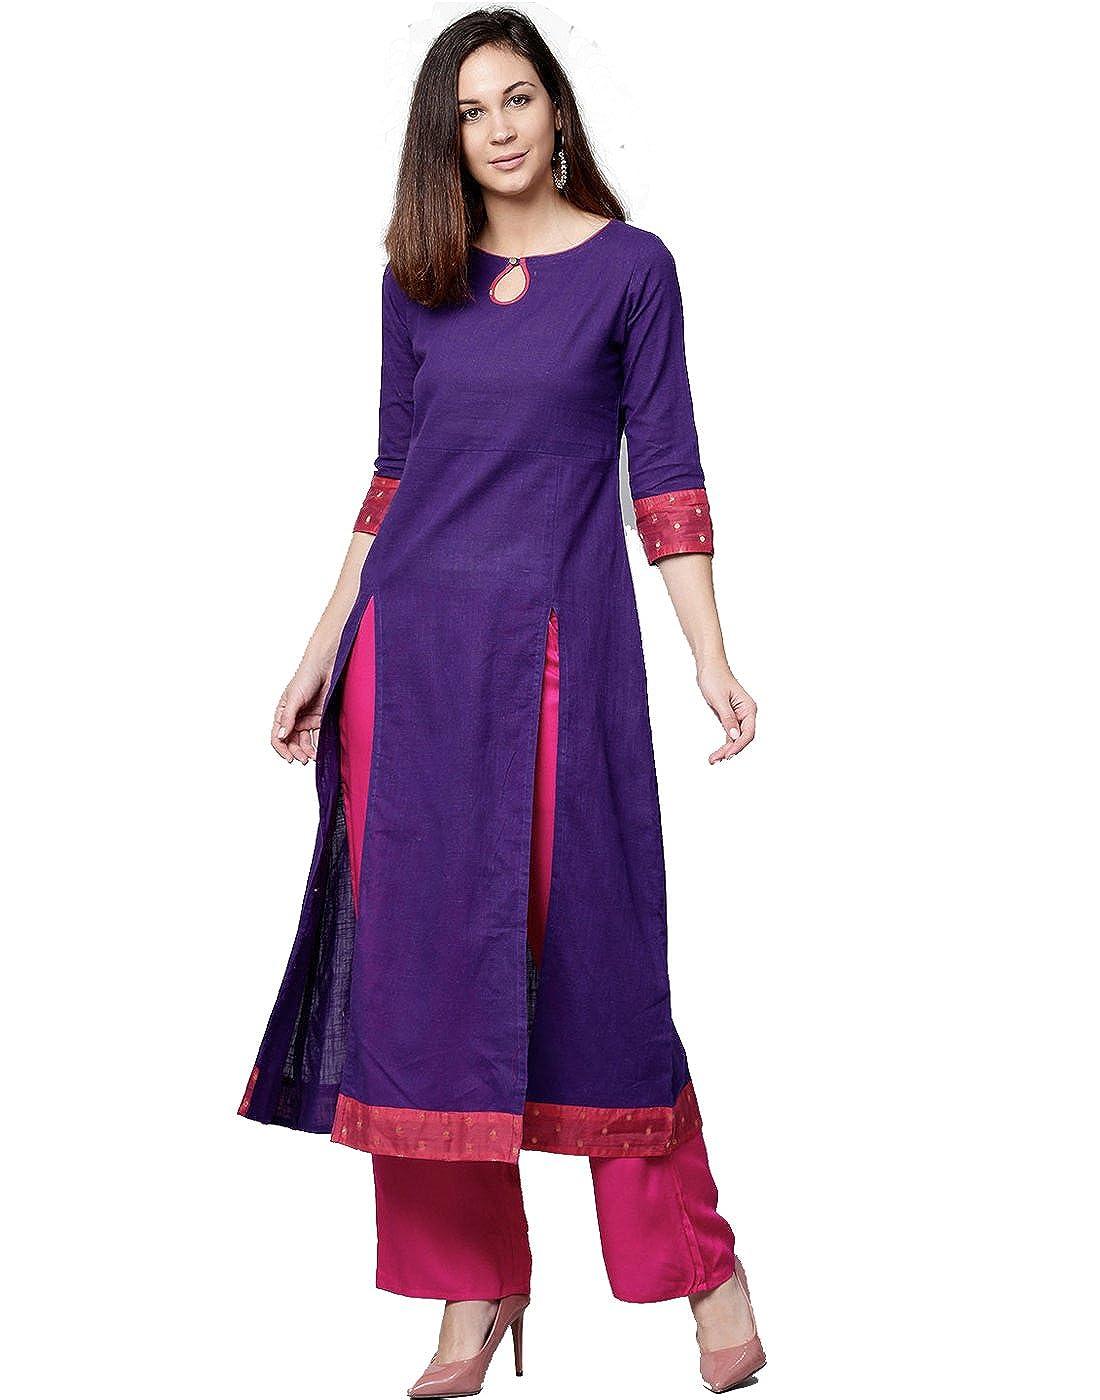 Jaipur Kurti Women Ethnic Casual Tunic Top Summer Dress Solid A-Line Cotton Slub & Chanderi Kurta & Palazzo (Purple & Rani)